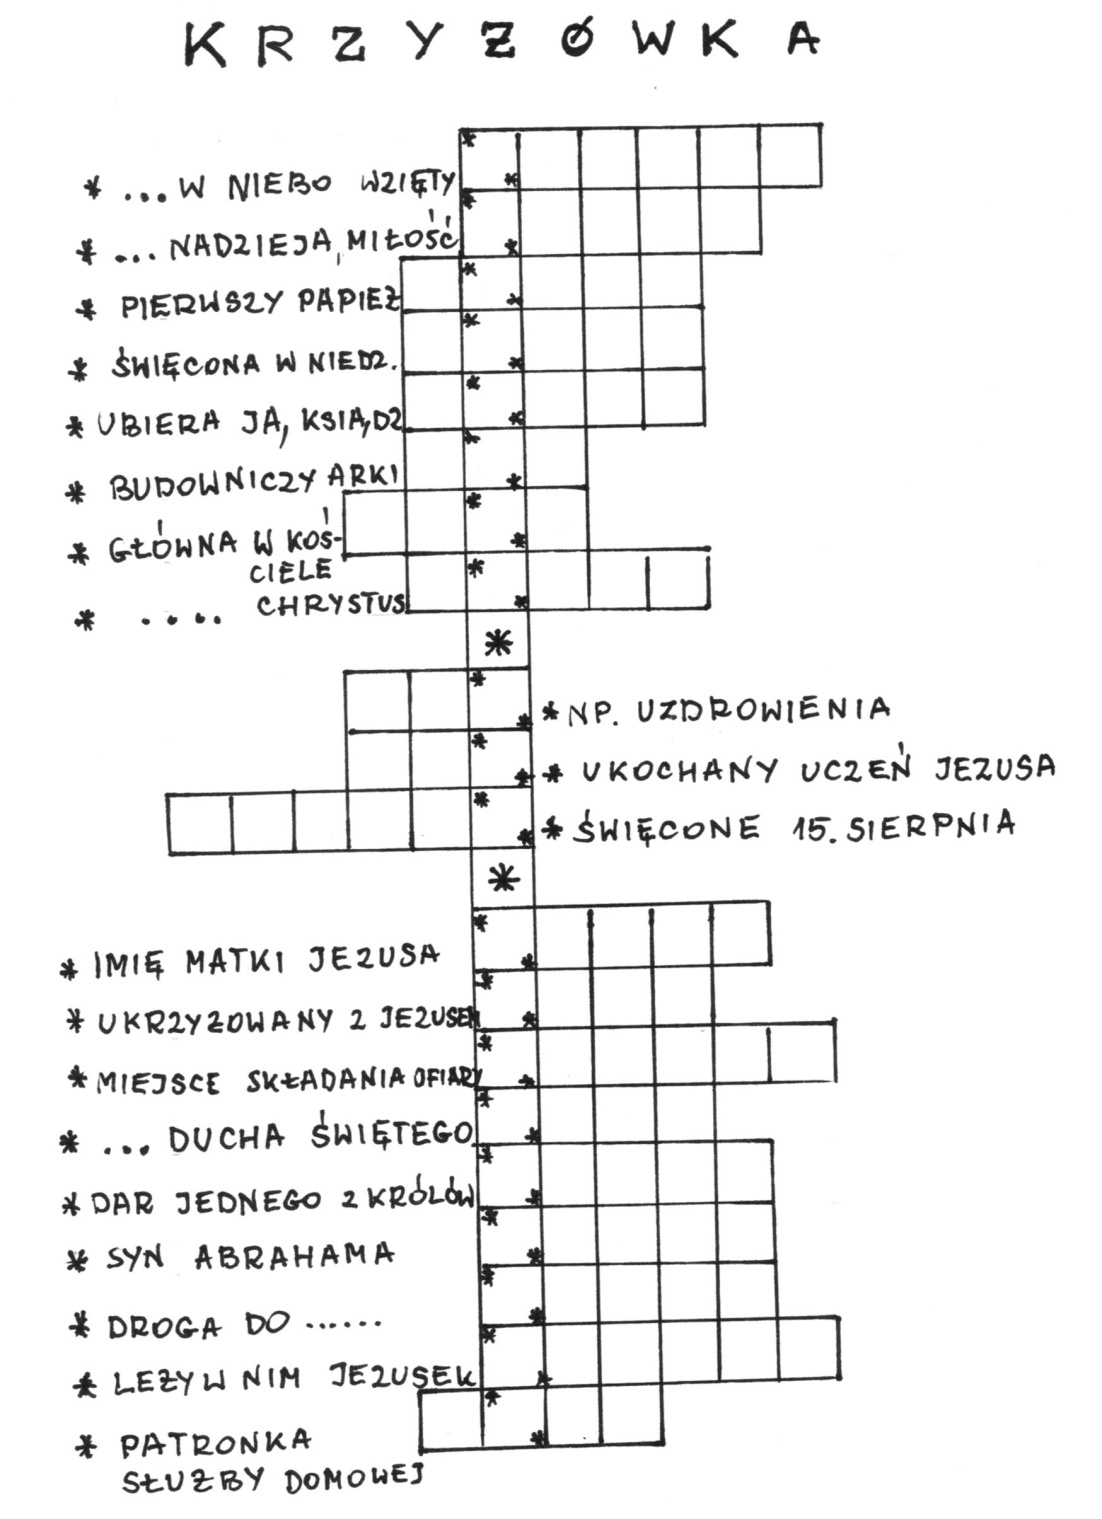 176krzyzowka2